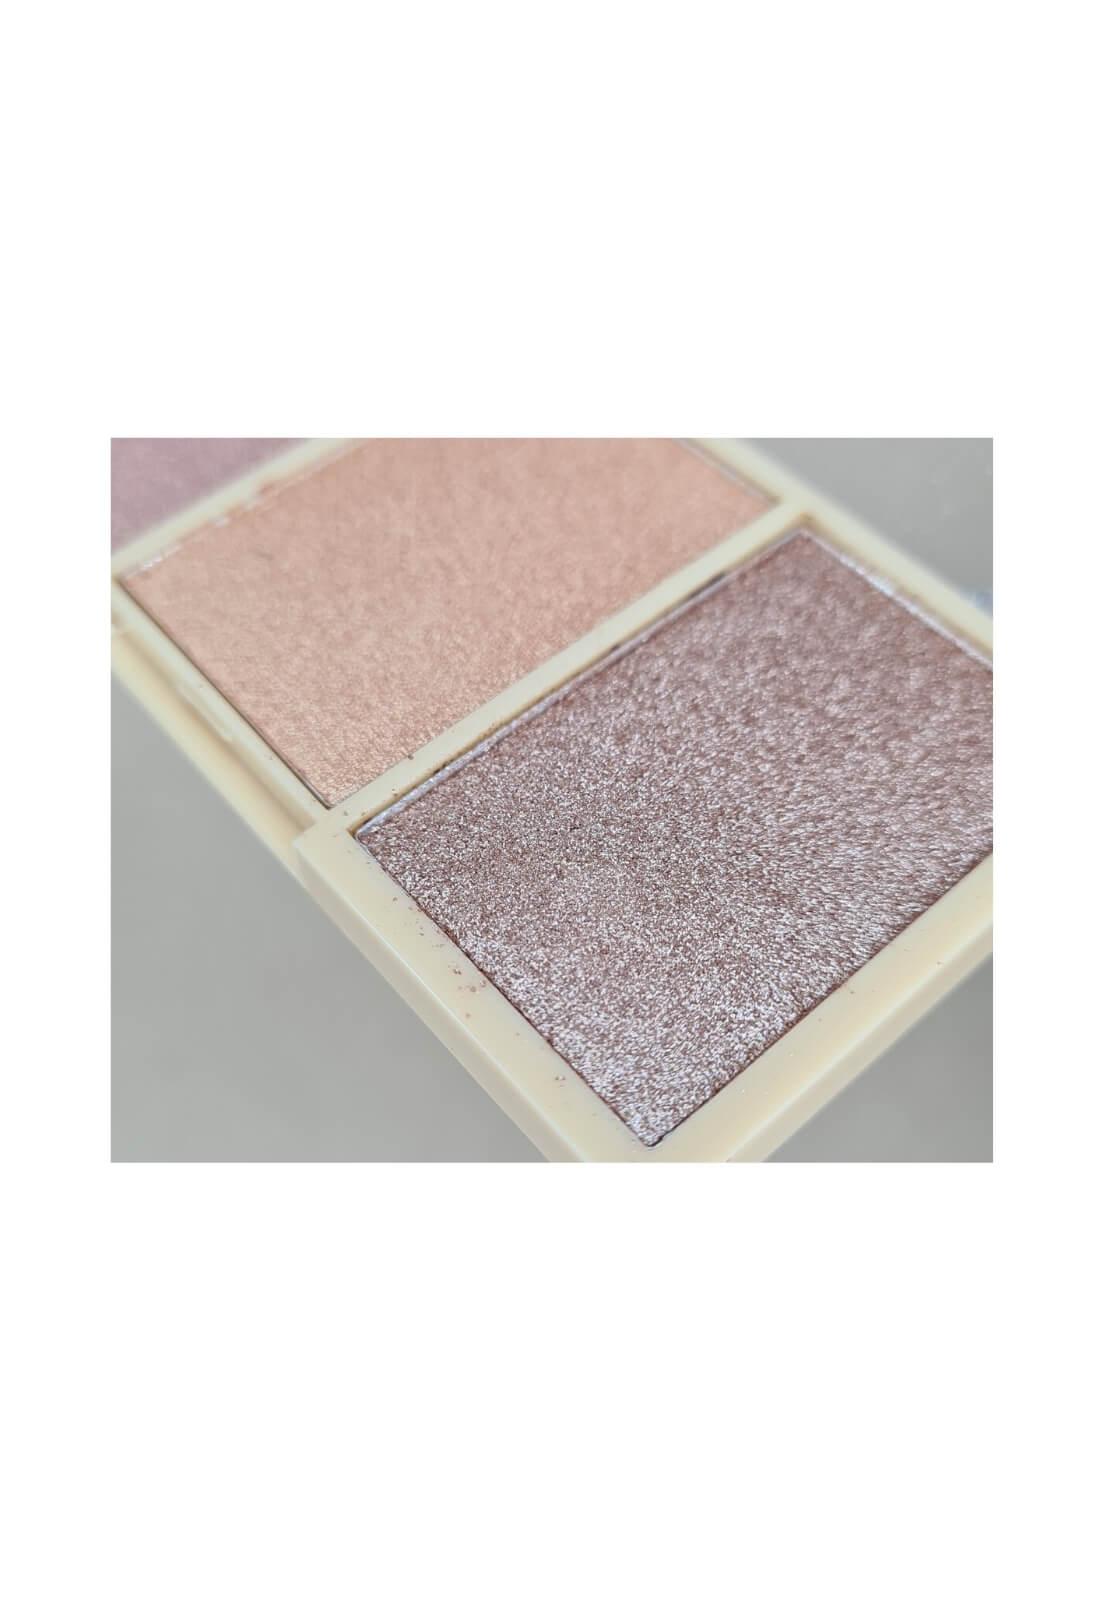 Paleta de iluminador Ruby Rose Glowing mini kit cor 3